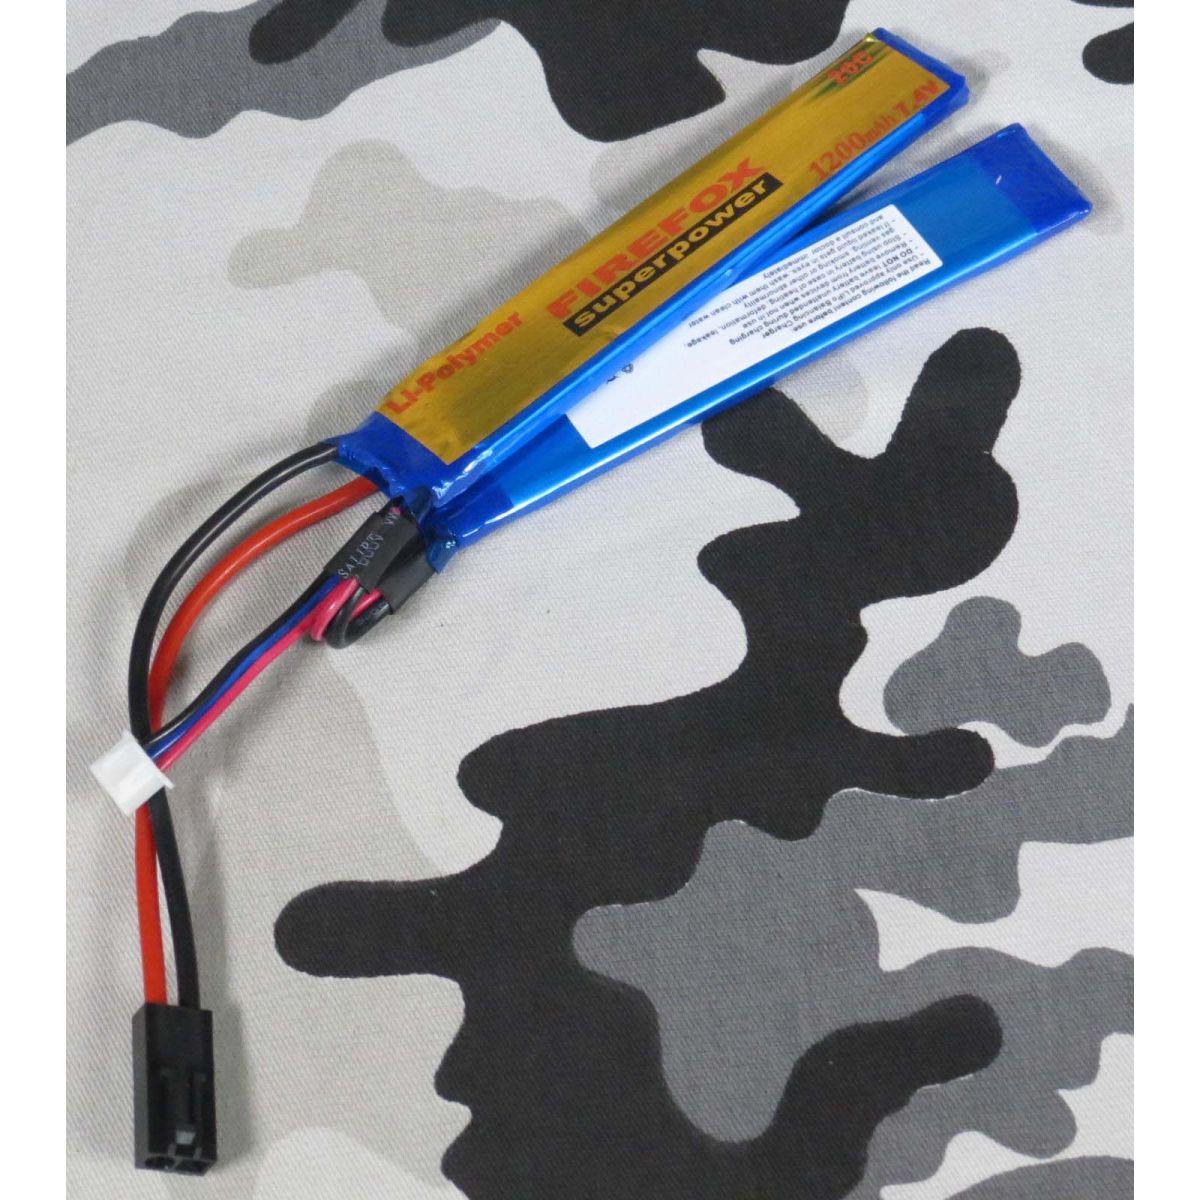 Bateria Li-Po FireFox 7.4V 20C - 1200 mAh (azul)  - MAB AIRSOFT